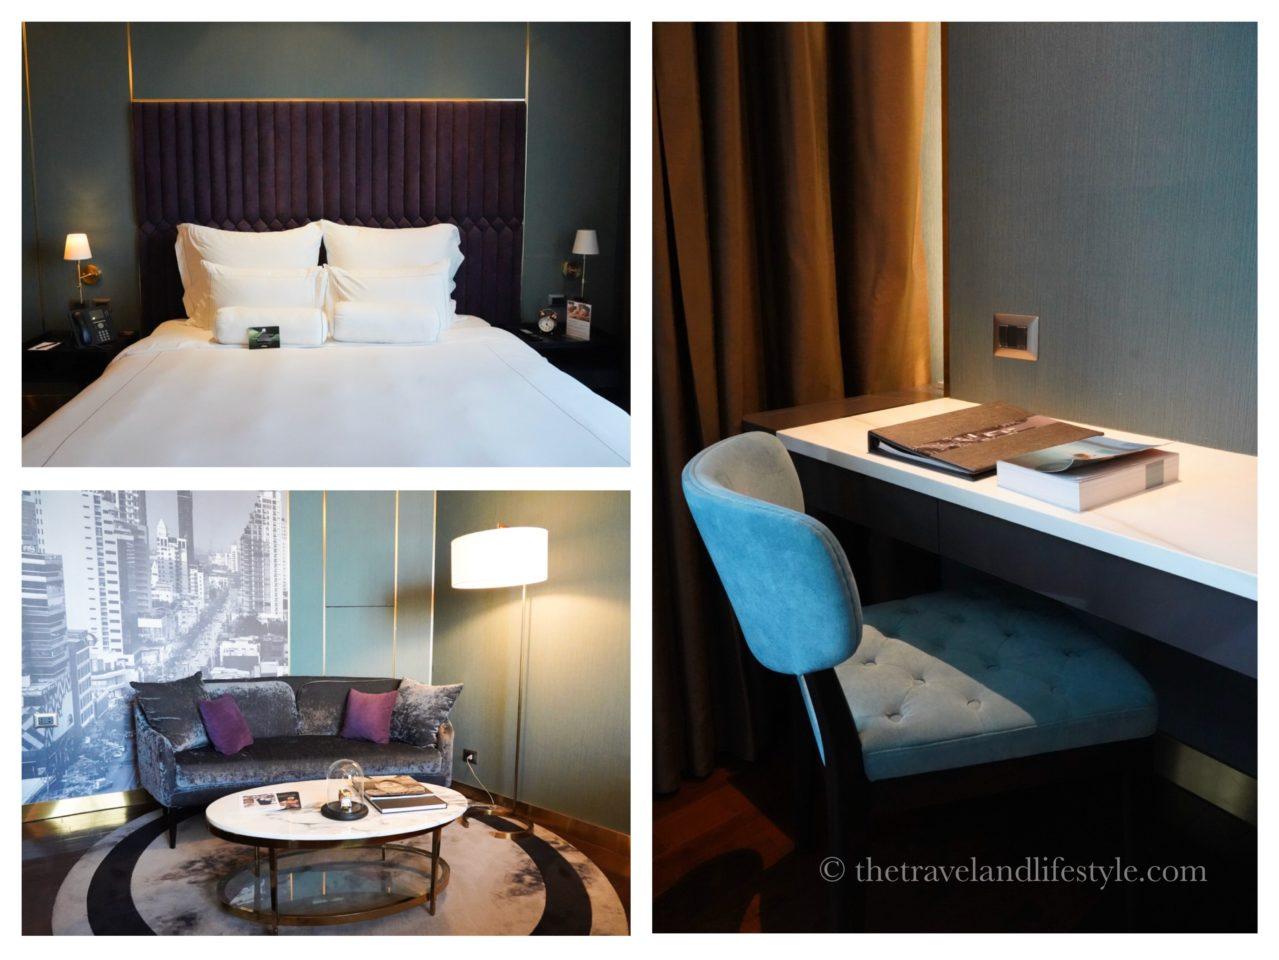 img 0702 - akyra Thonglor Bangkok -  バンコクのラグジュアリーデザイナーズホテル